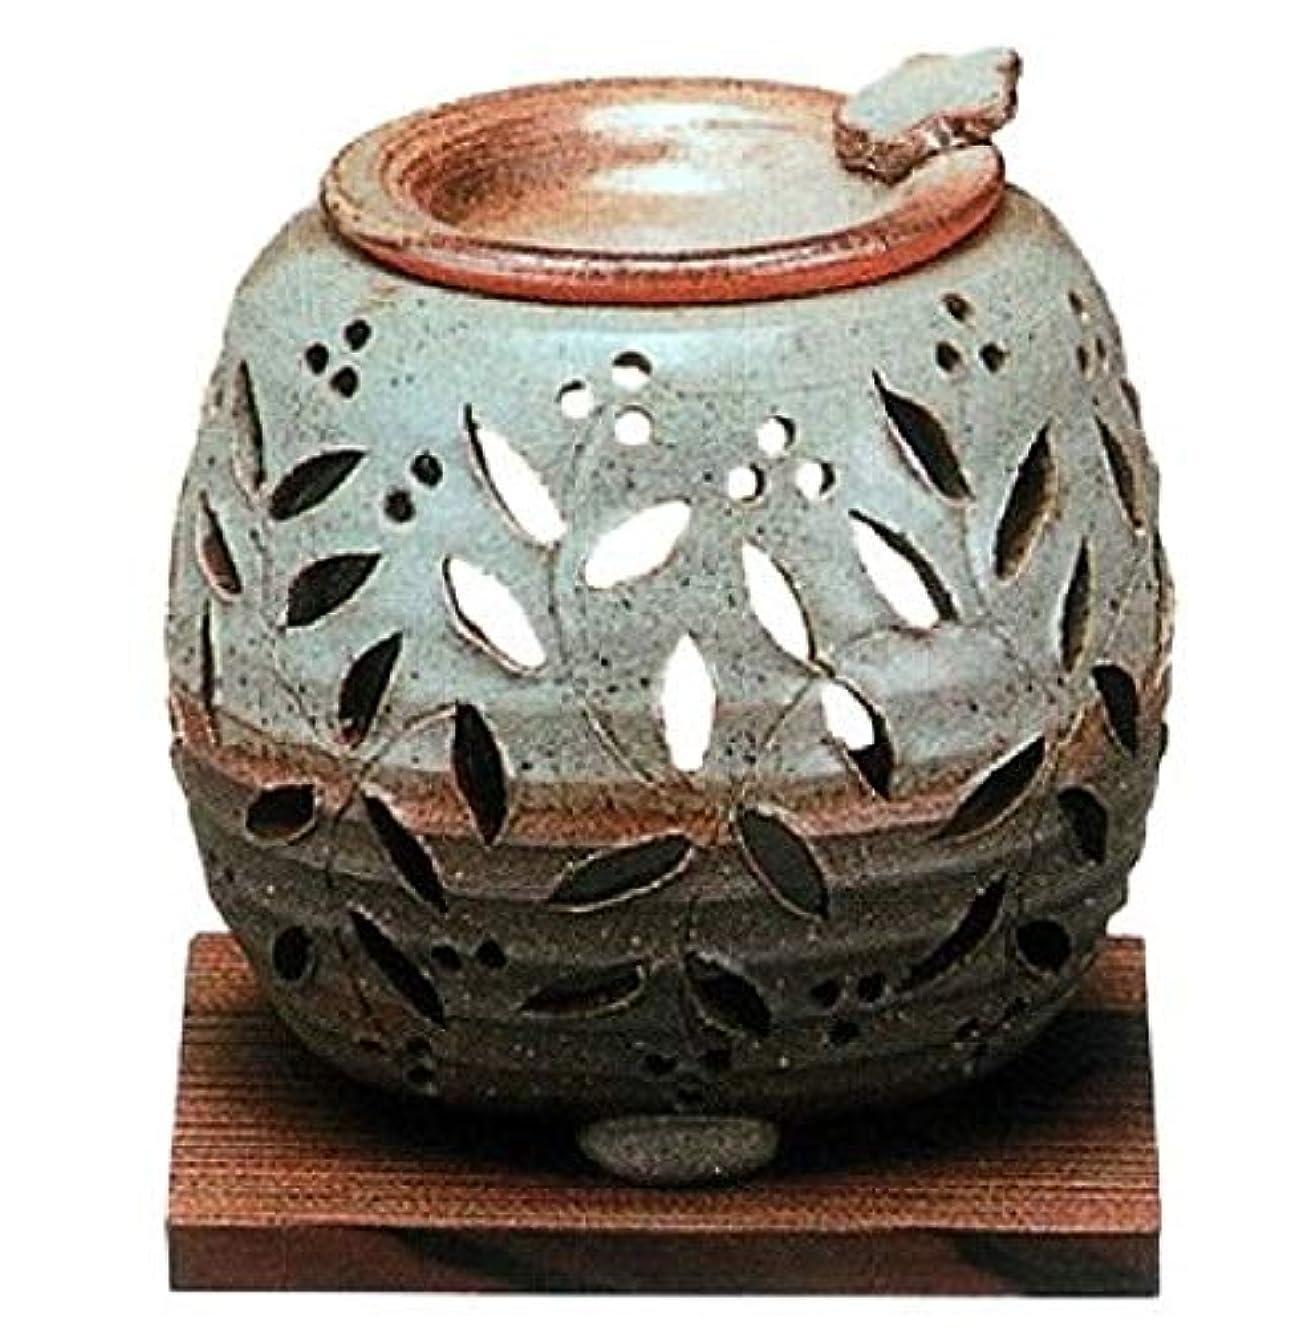 傷跡ライン困惑常滑焼?石龍窯 カ38-10 茶香炉 焼杉板付 径10×10cm